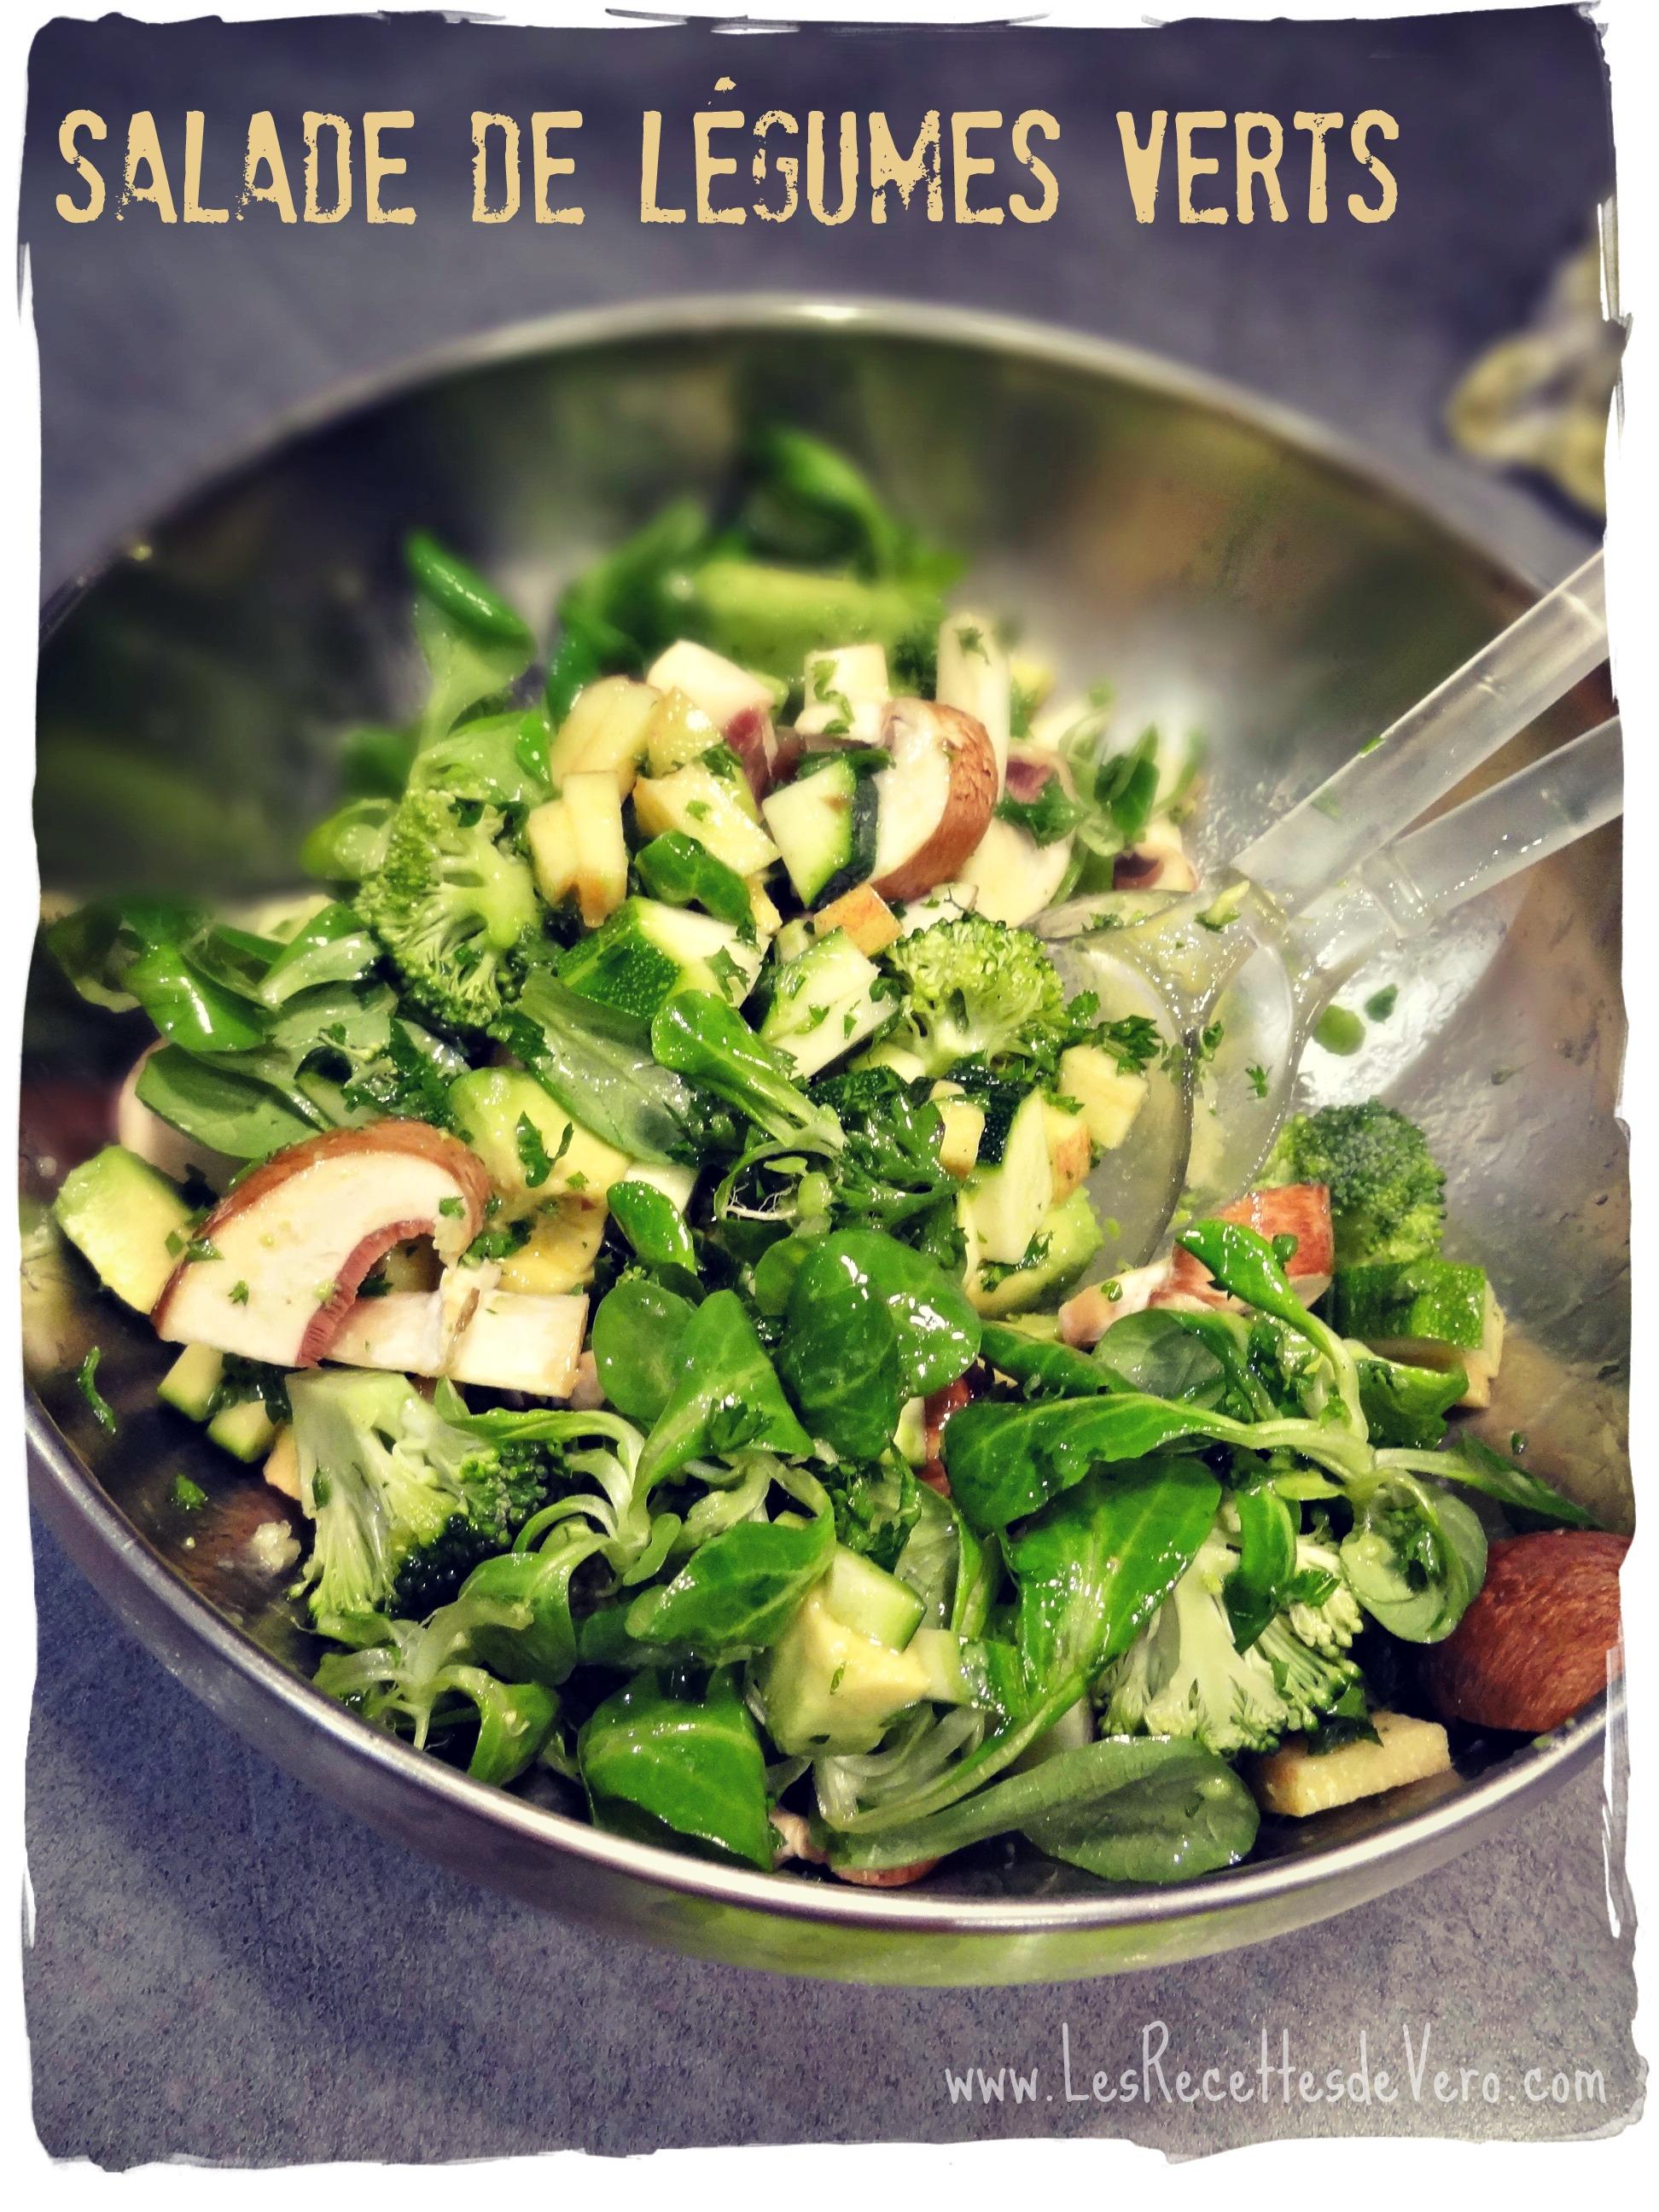 Salade légumes verts